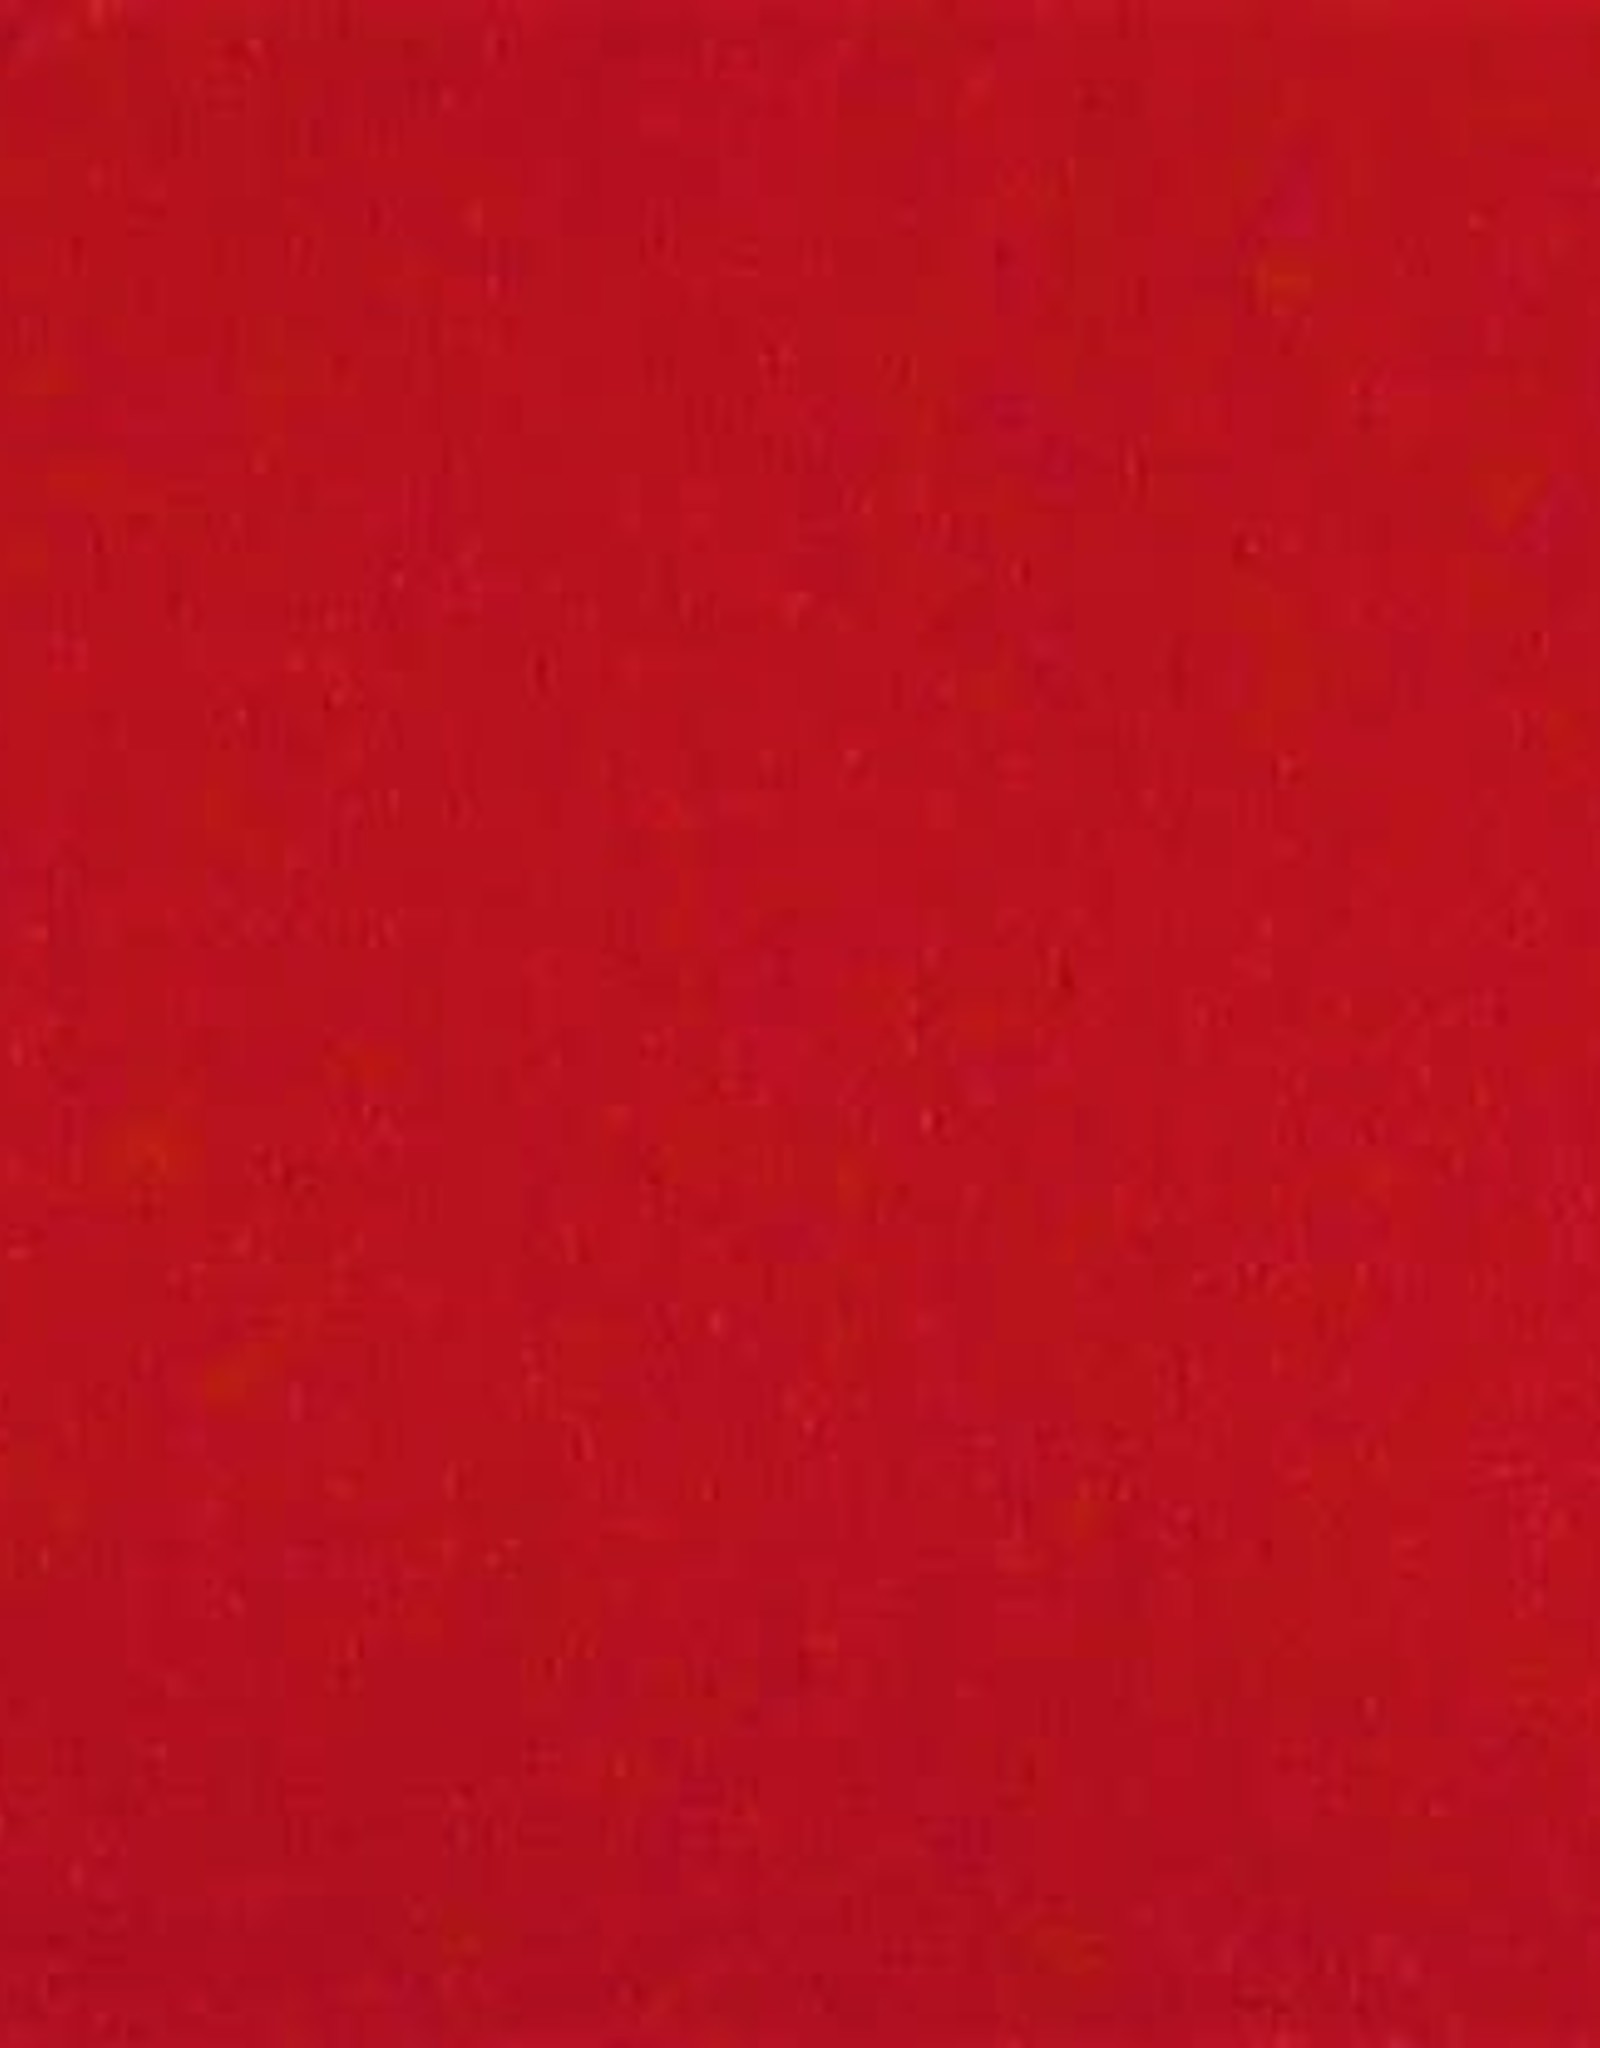 Chiffon 58 - 60 Inches Red (Yard)